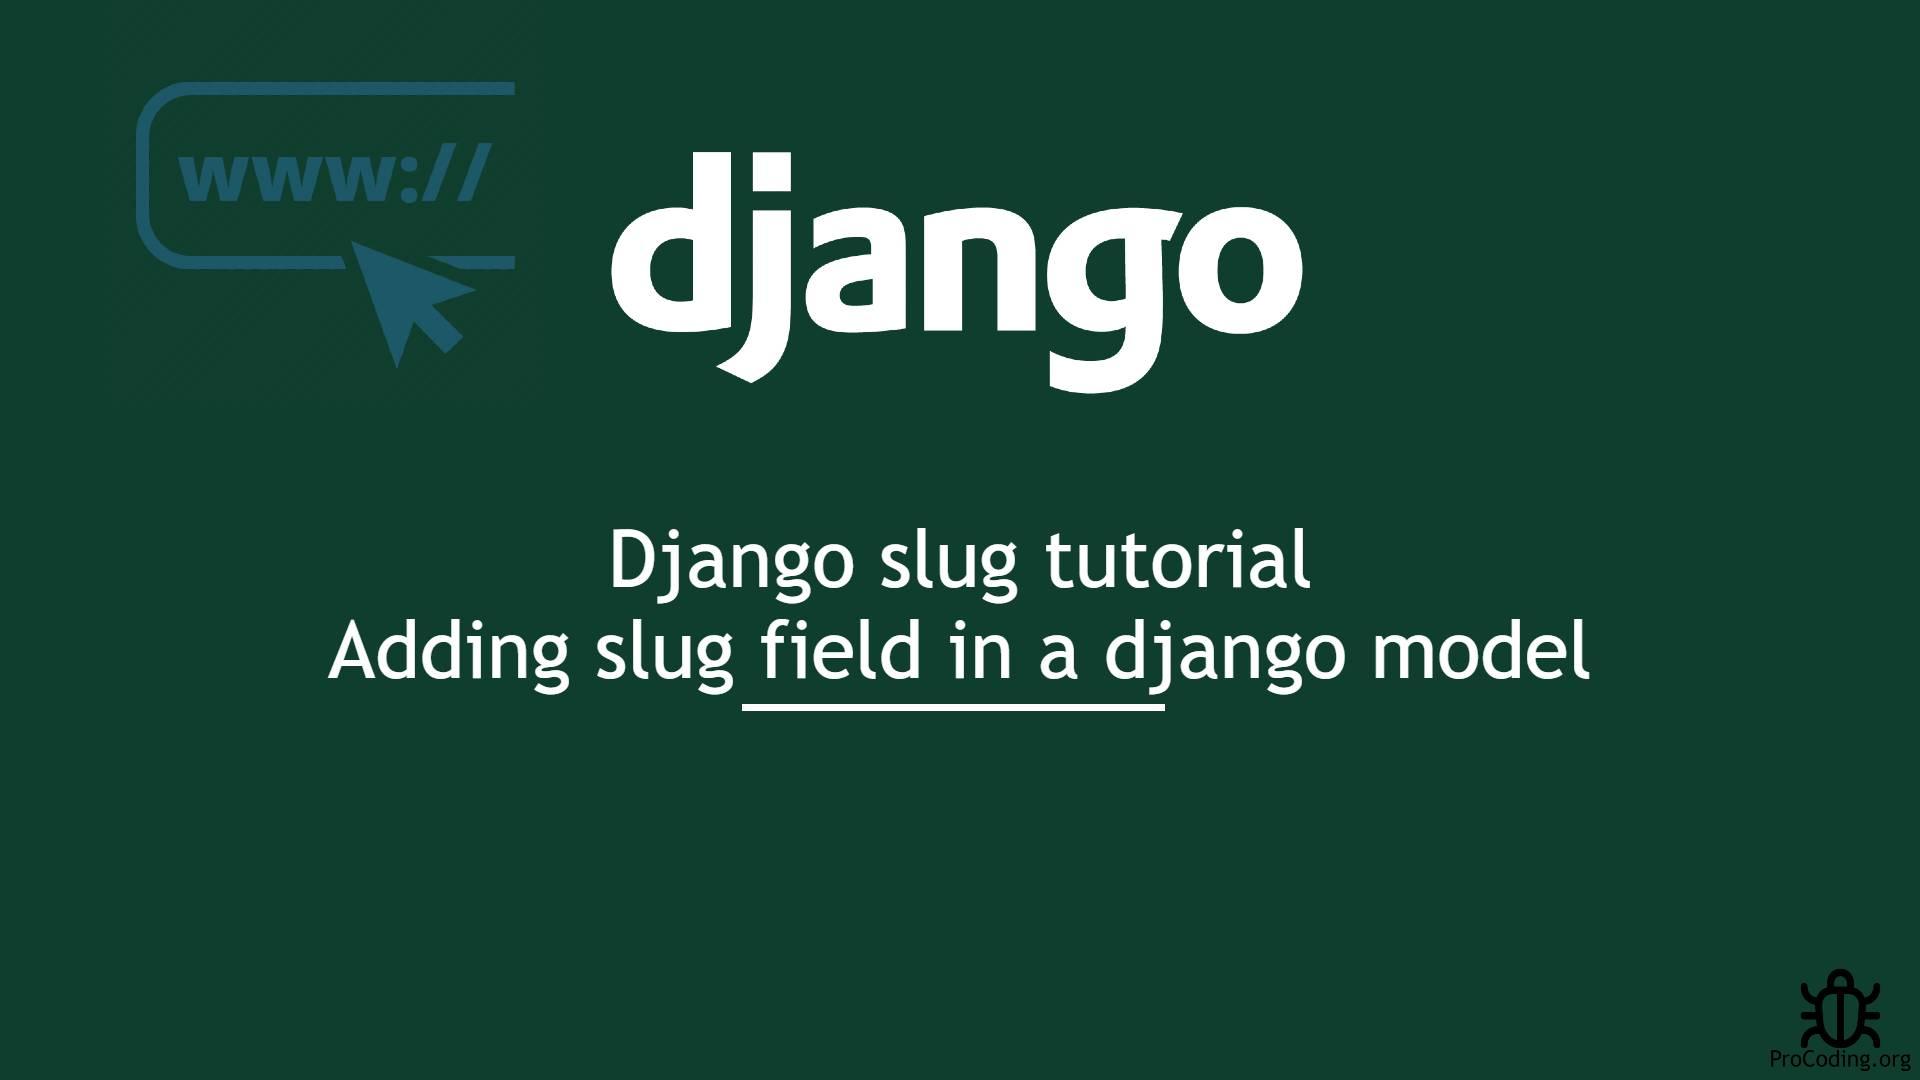 django slug tutorial